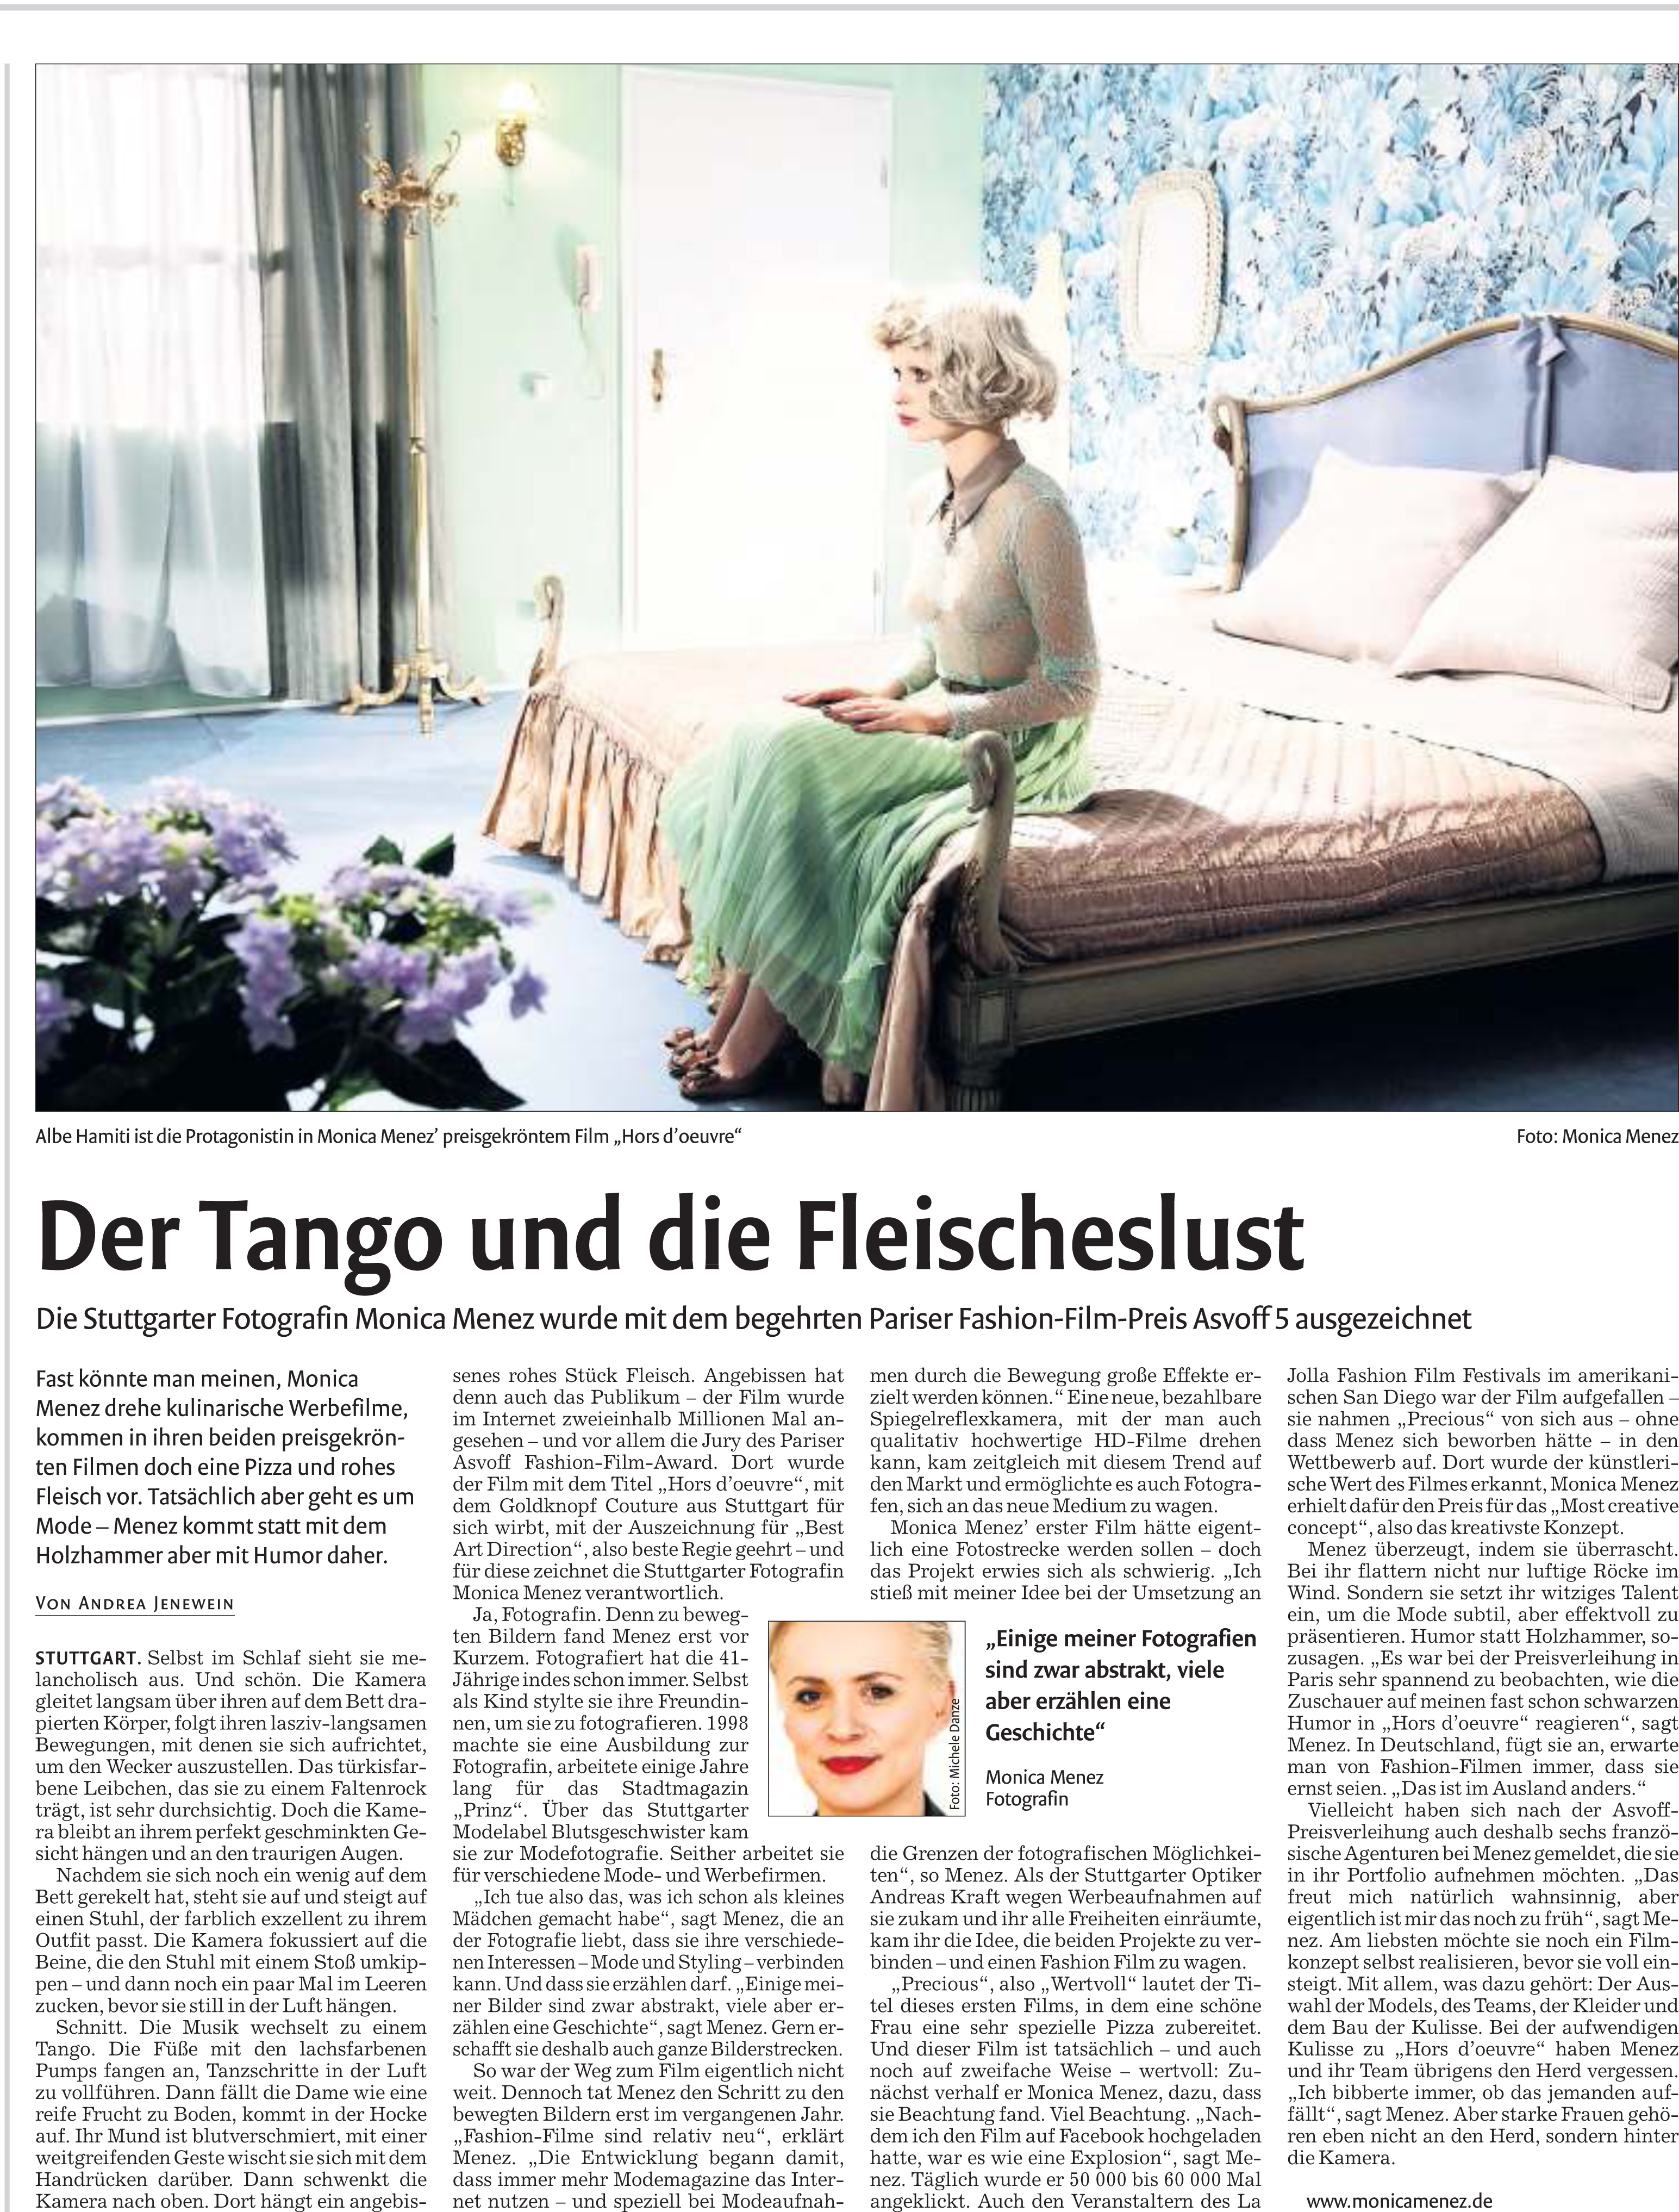 Bericht Stuttgarter Nachrichten 12.12.2012